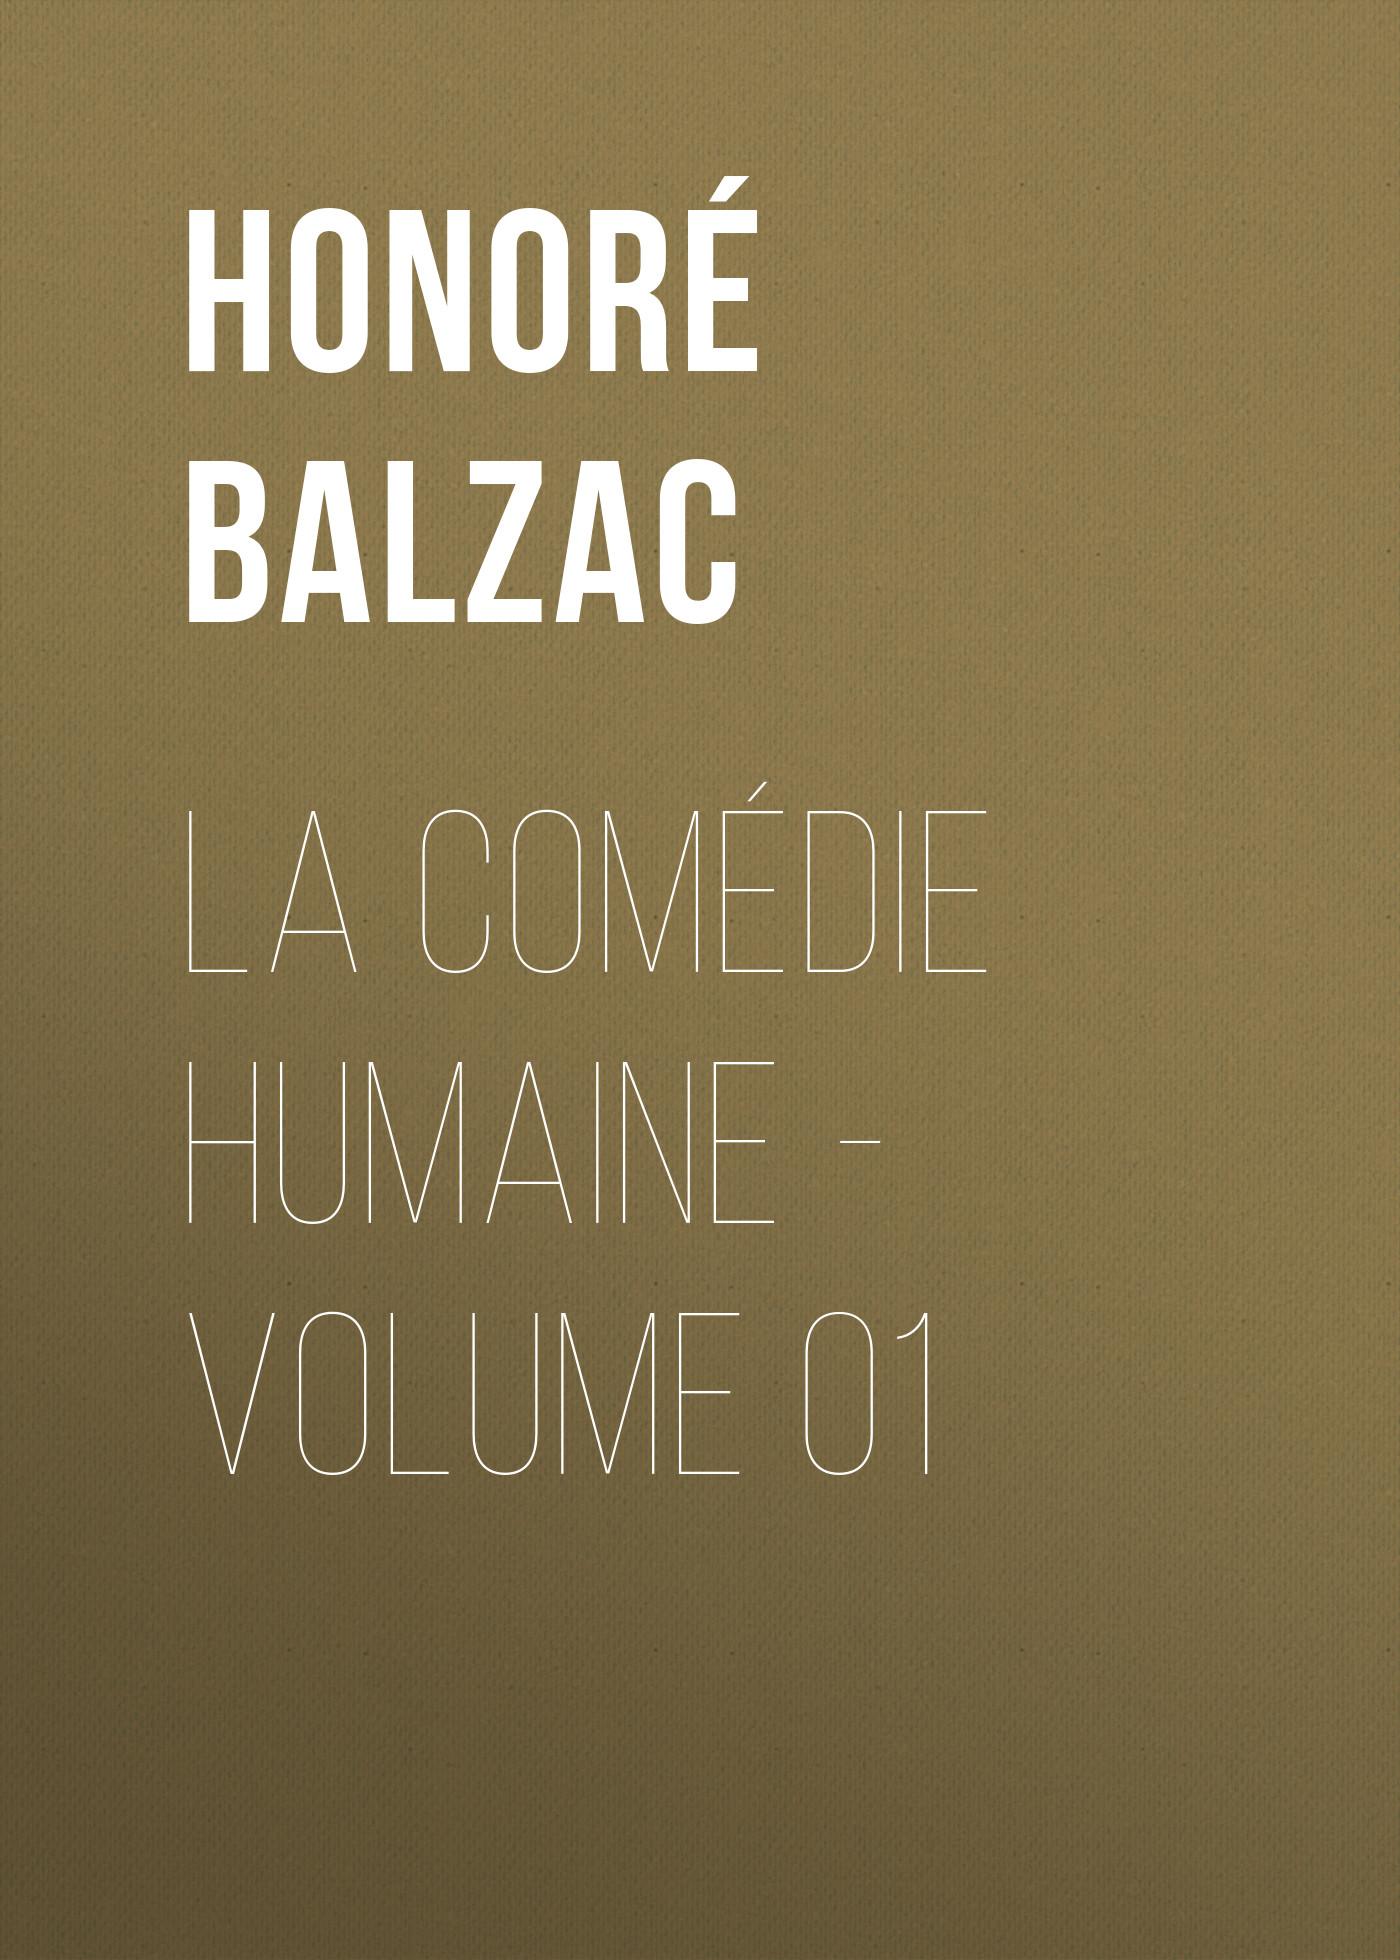 la comedie humaine volume 01